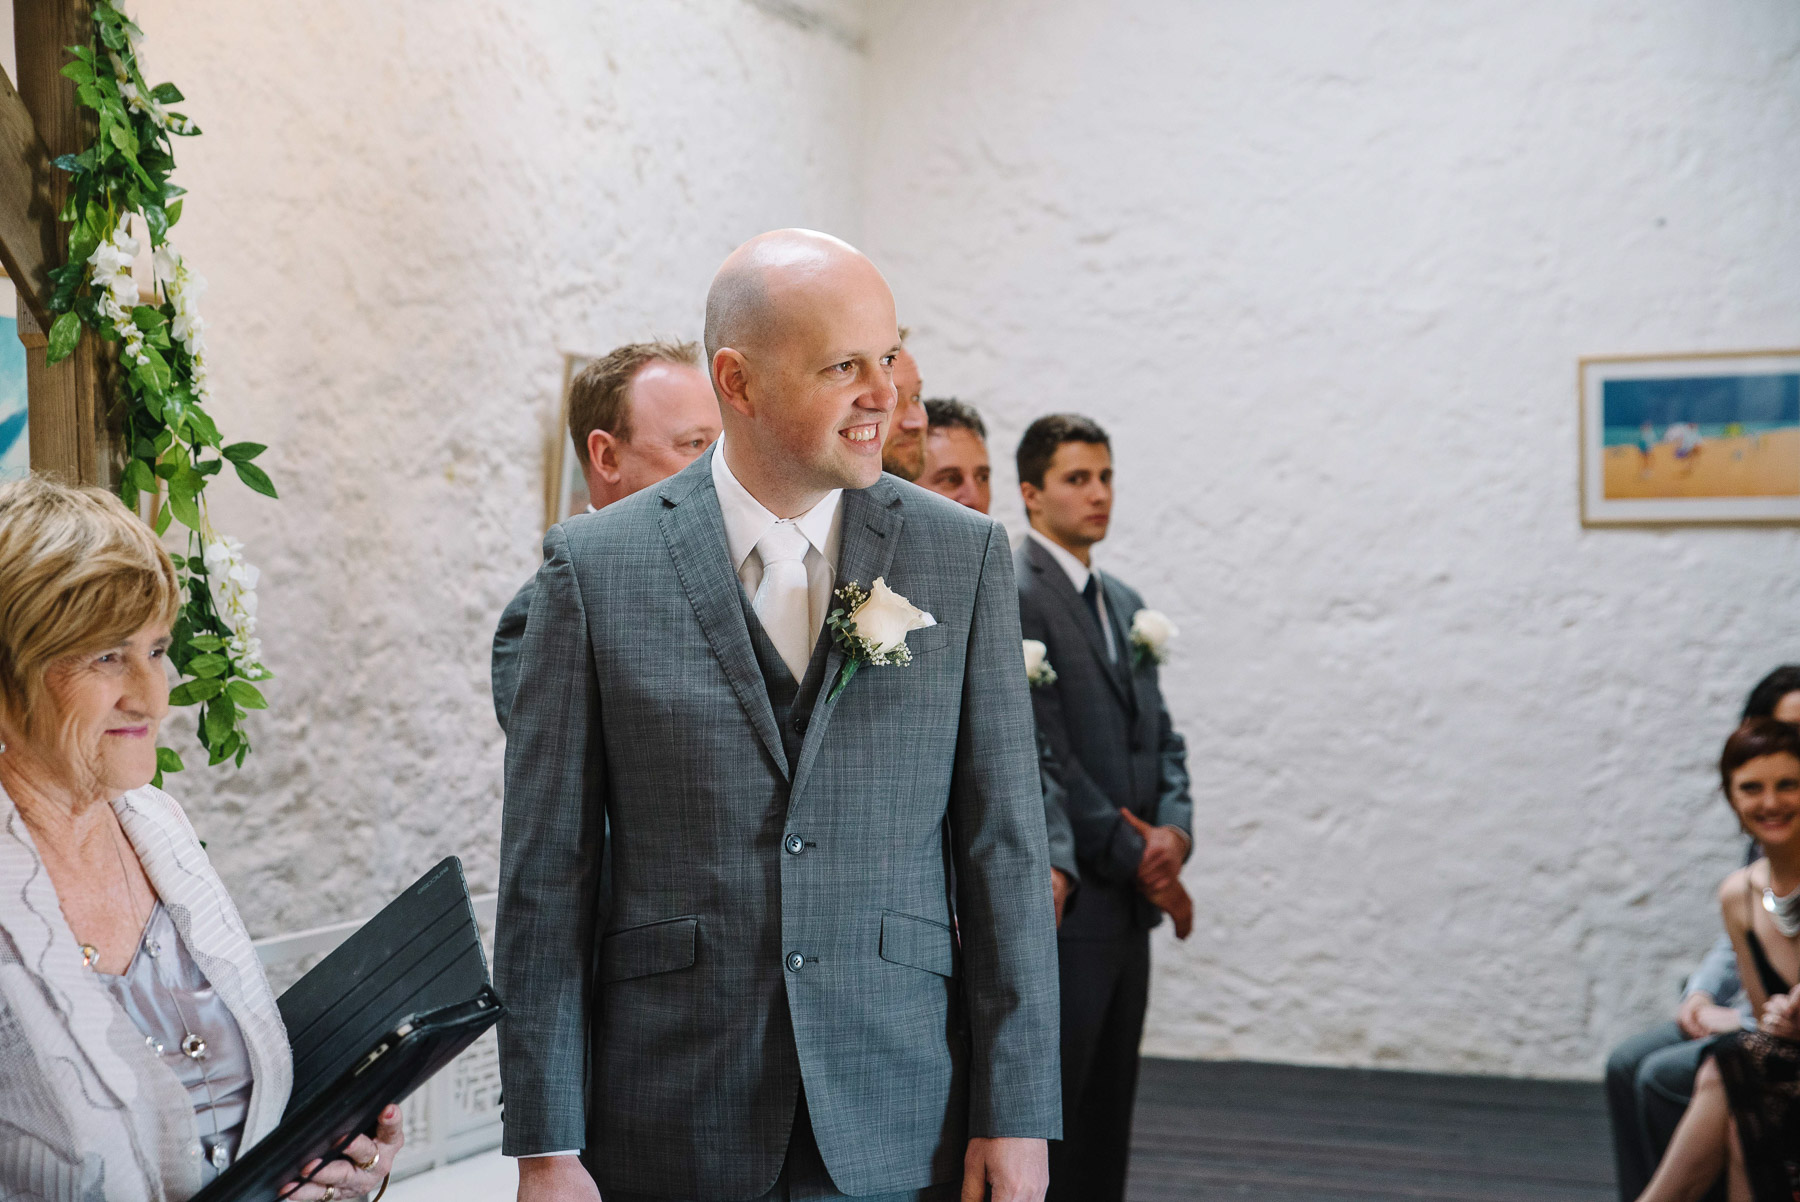 27-natural wedding photography fremantle.jpg